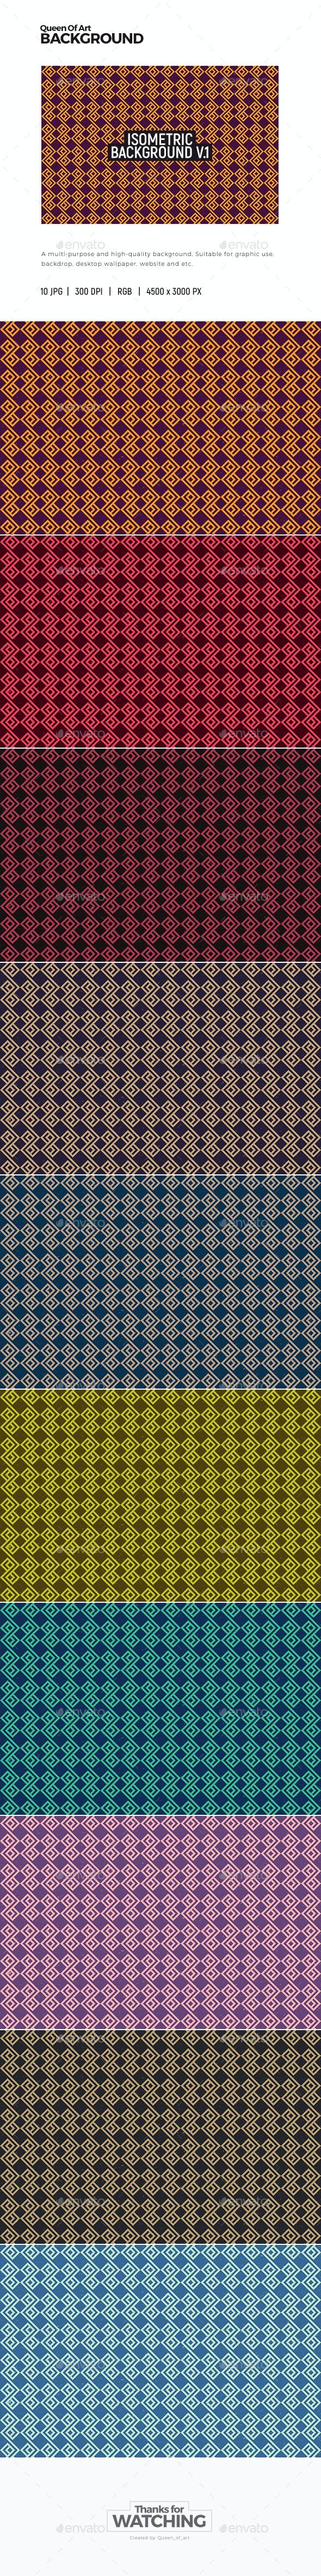 Isometric Background 1 - Patterns Backgrounds